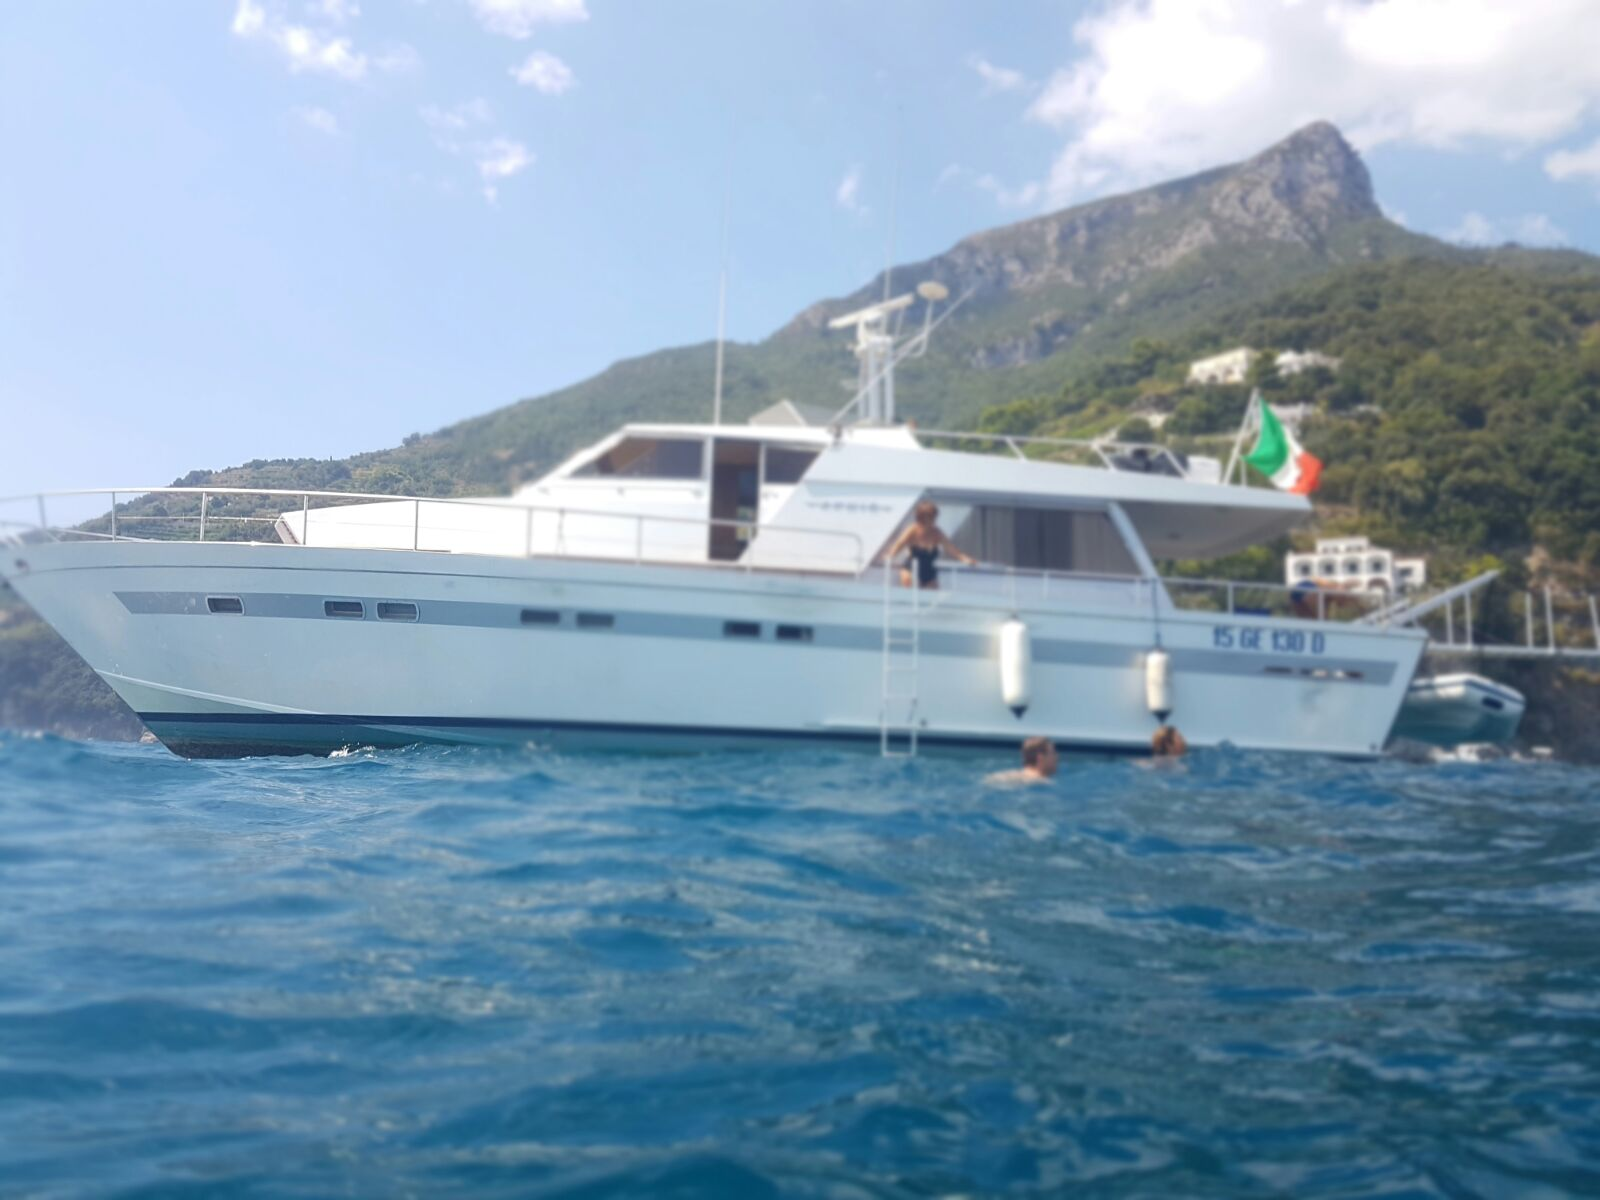 Italy, Salerno, Amalfi Coast